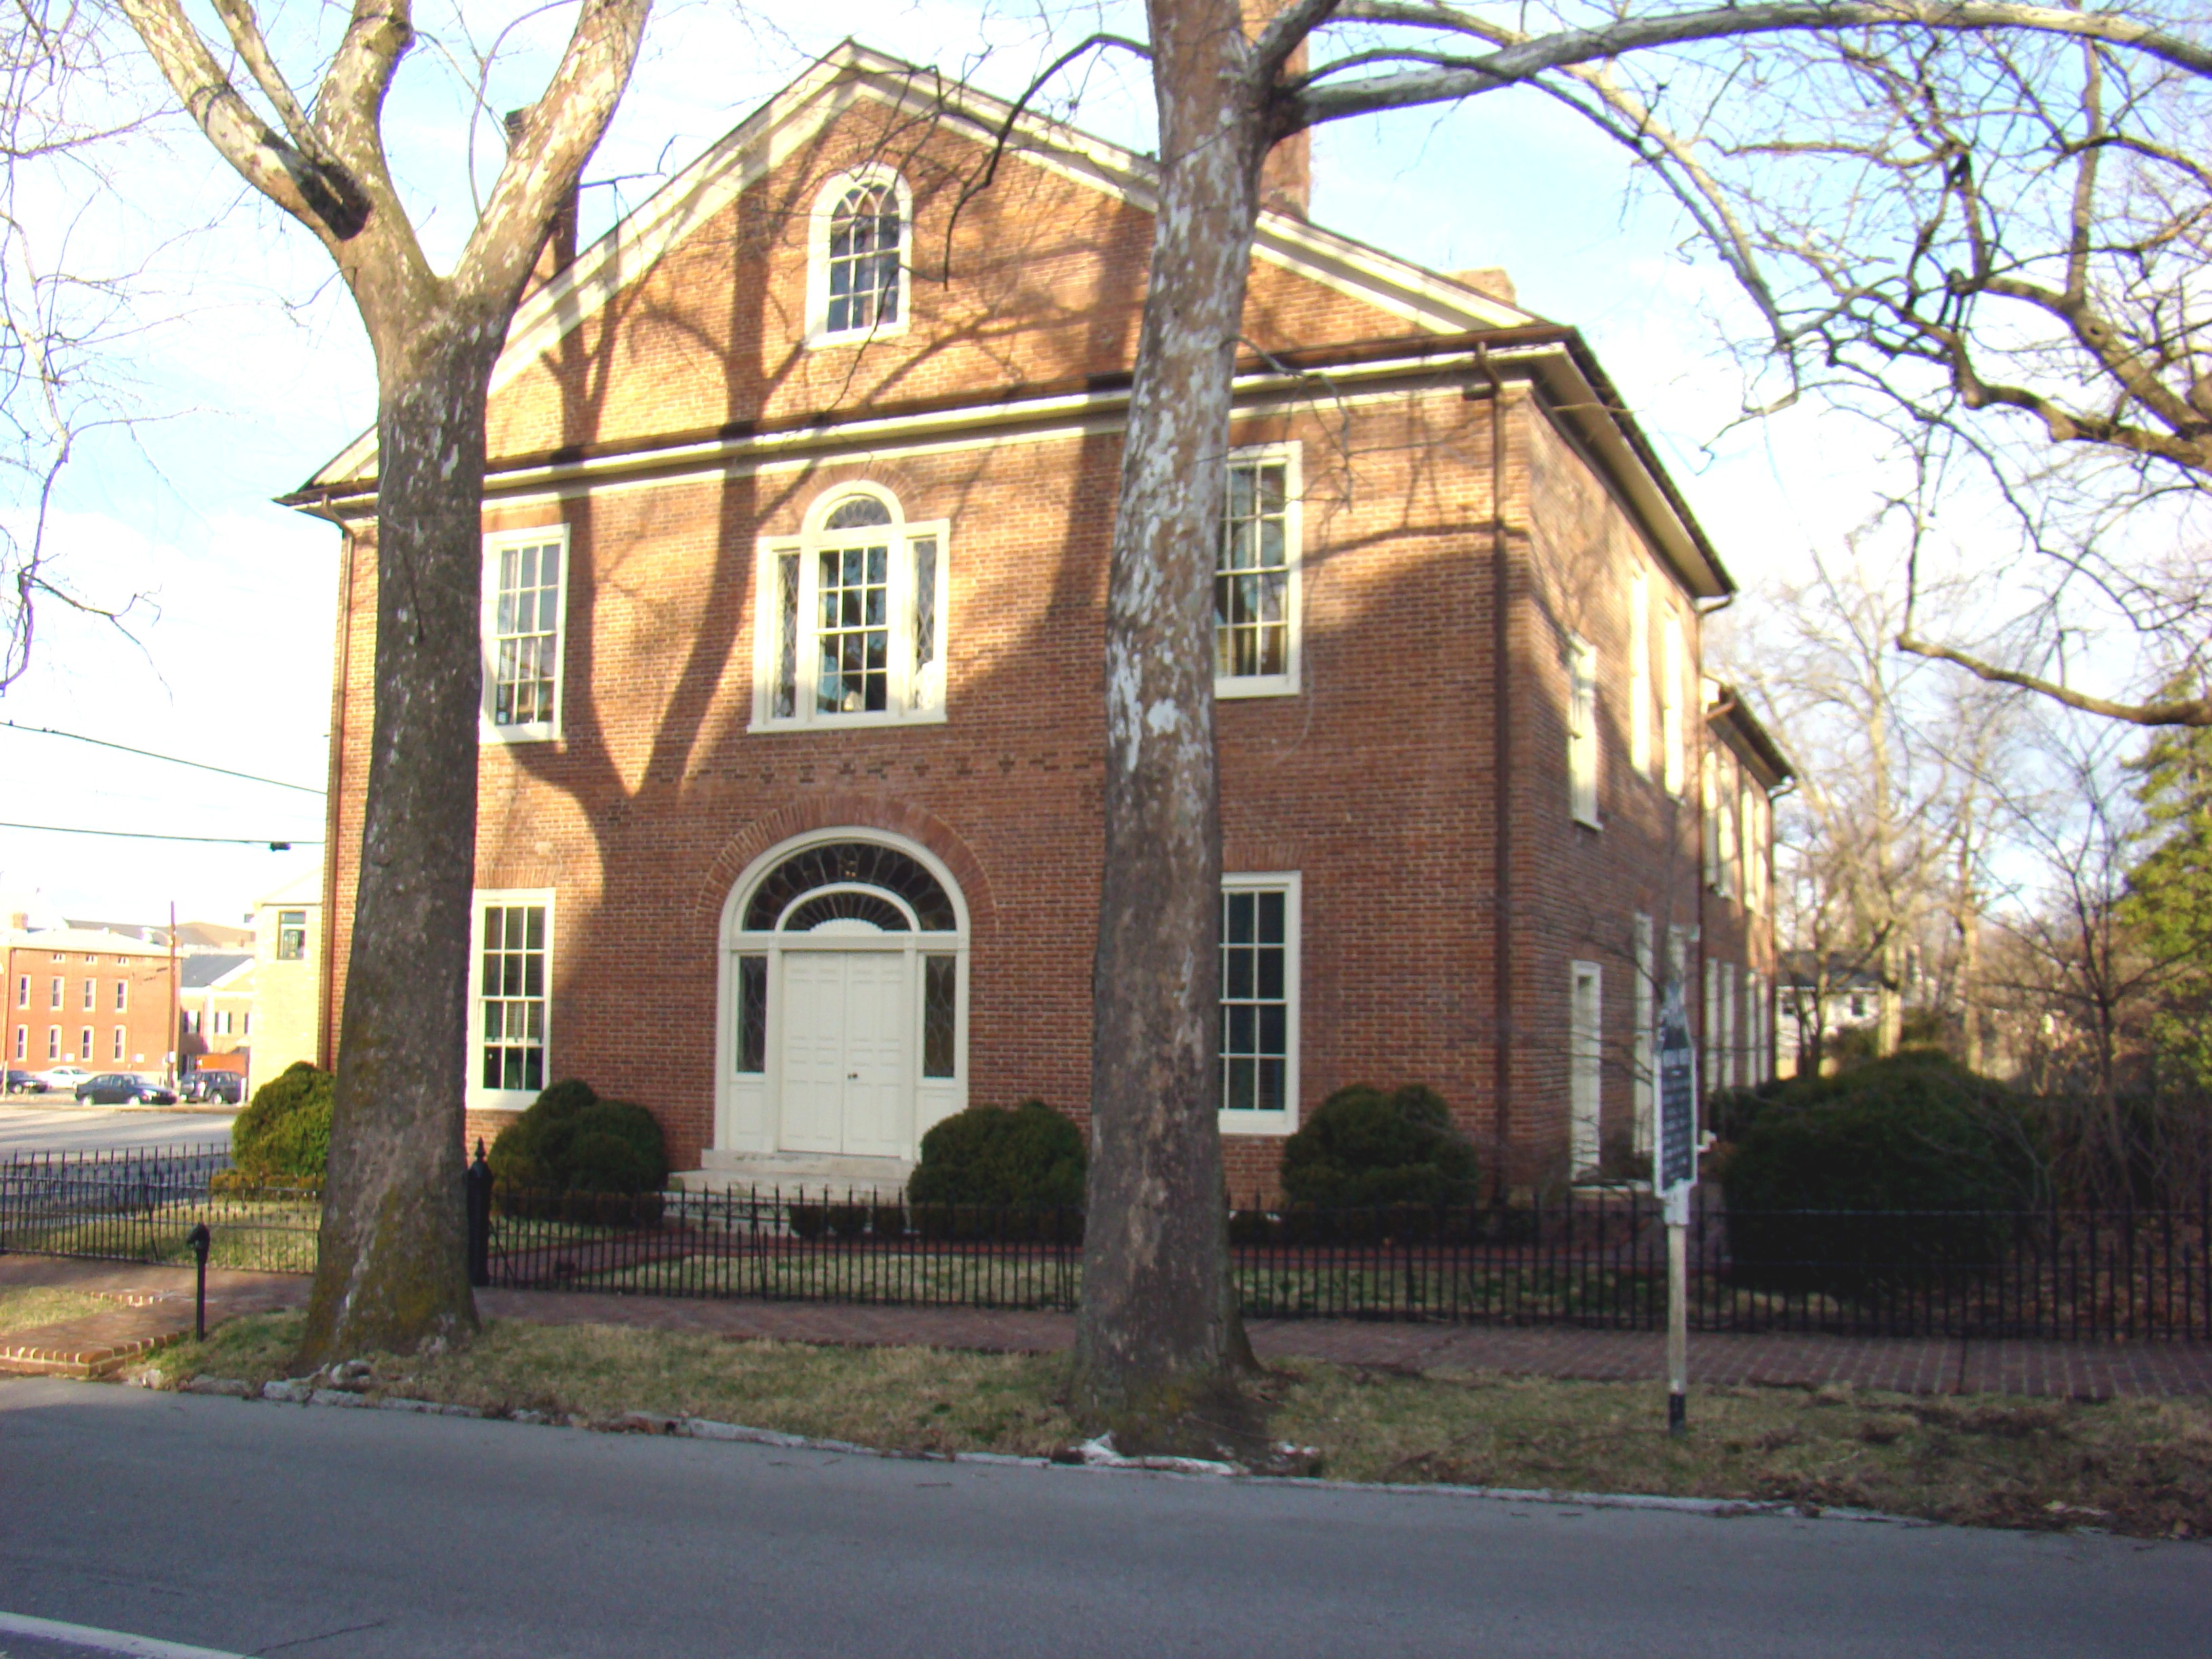 FileHunt Morgan House Lexington Kentuckyg Wikimedia mons